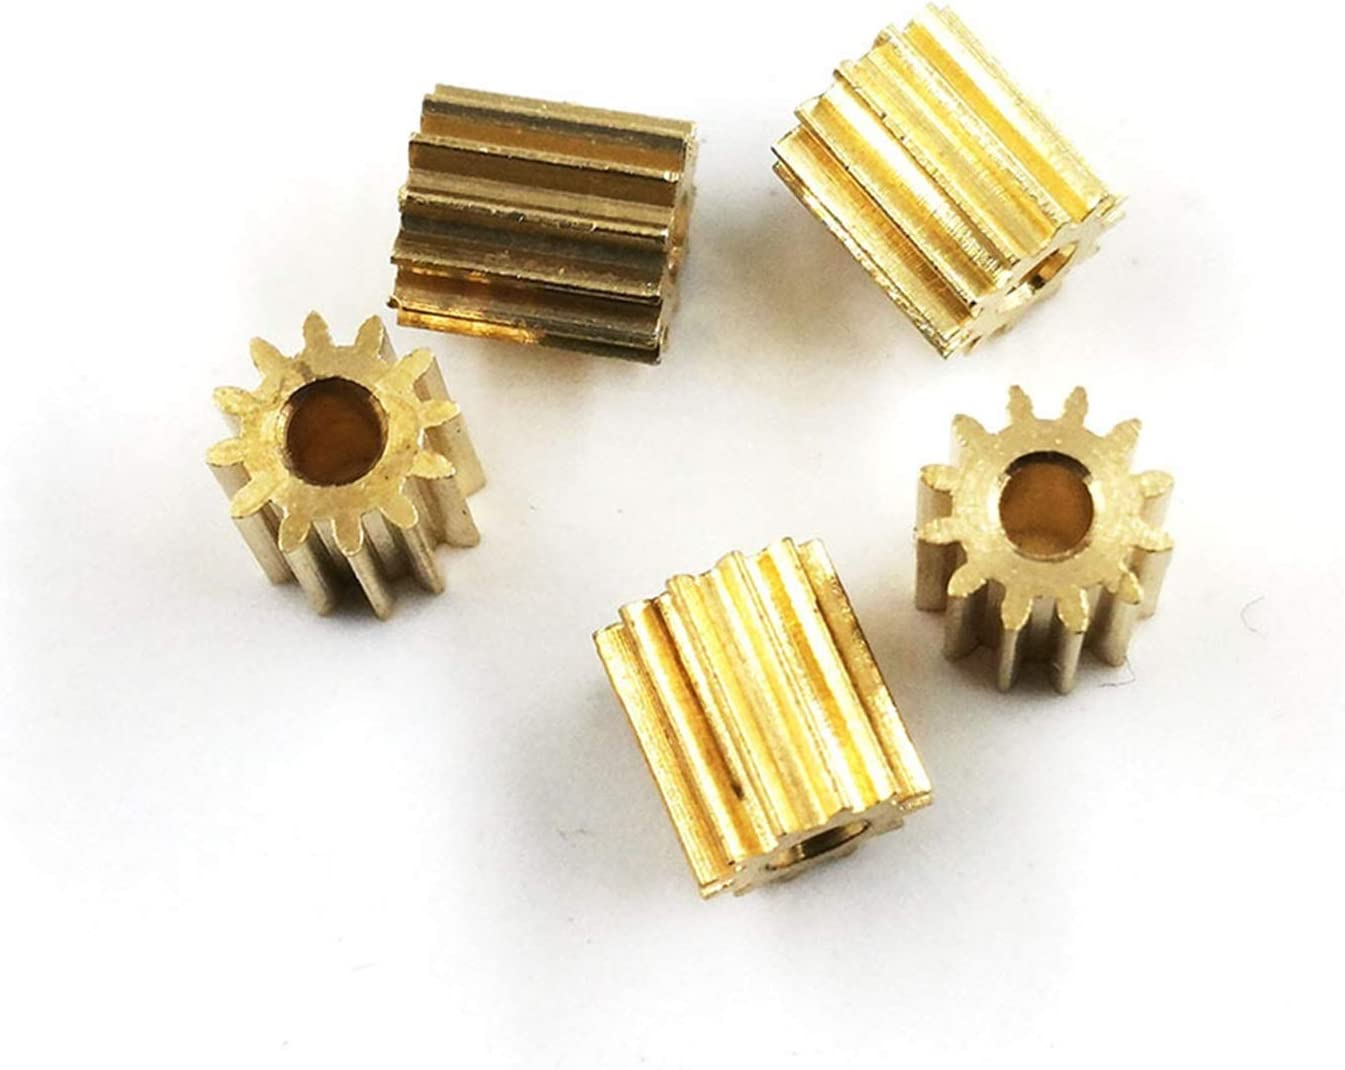 online shop DINGGUANGHE-CUP Durable Direct store 122A 0.4M Metal 2mm 5 Diameter Gears 12T